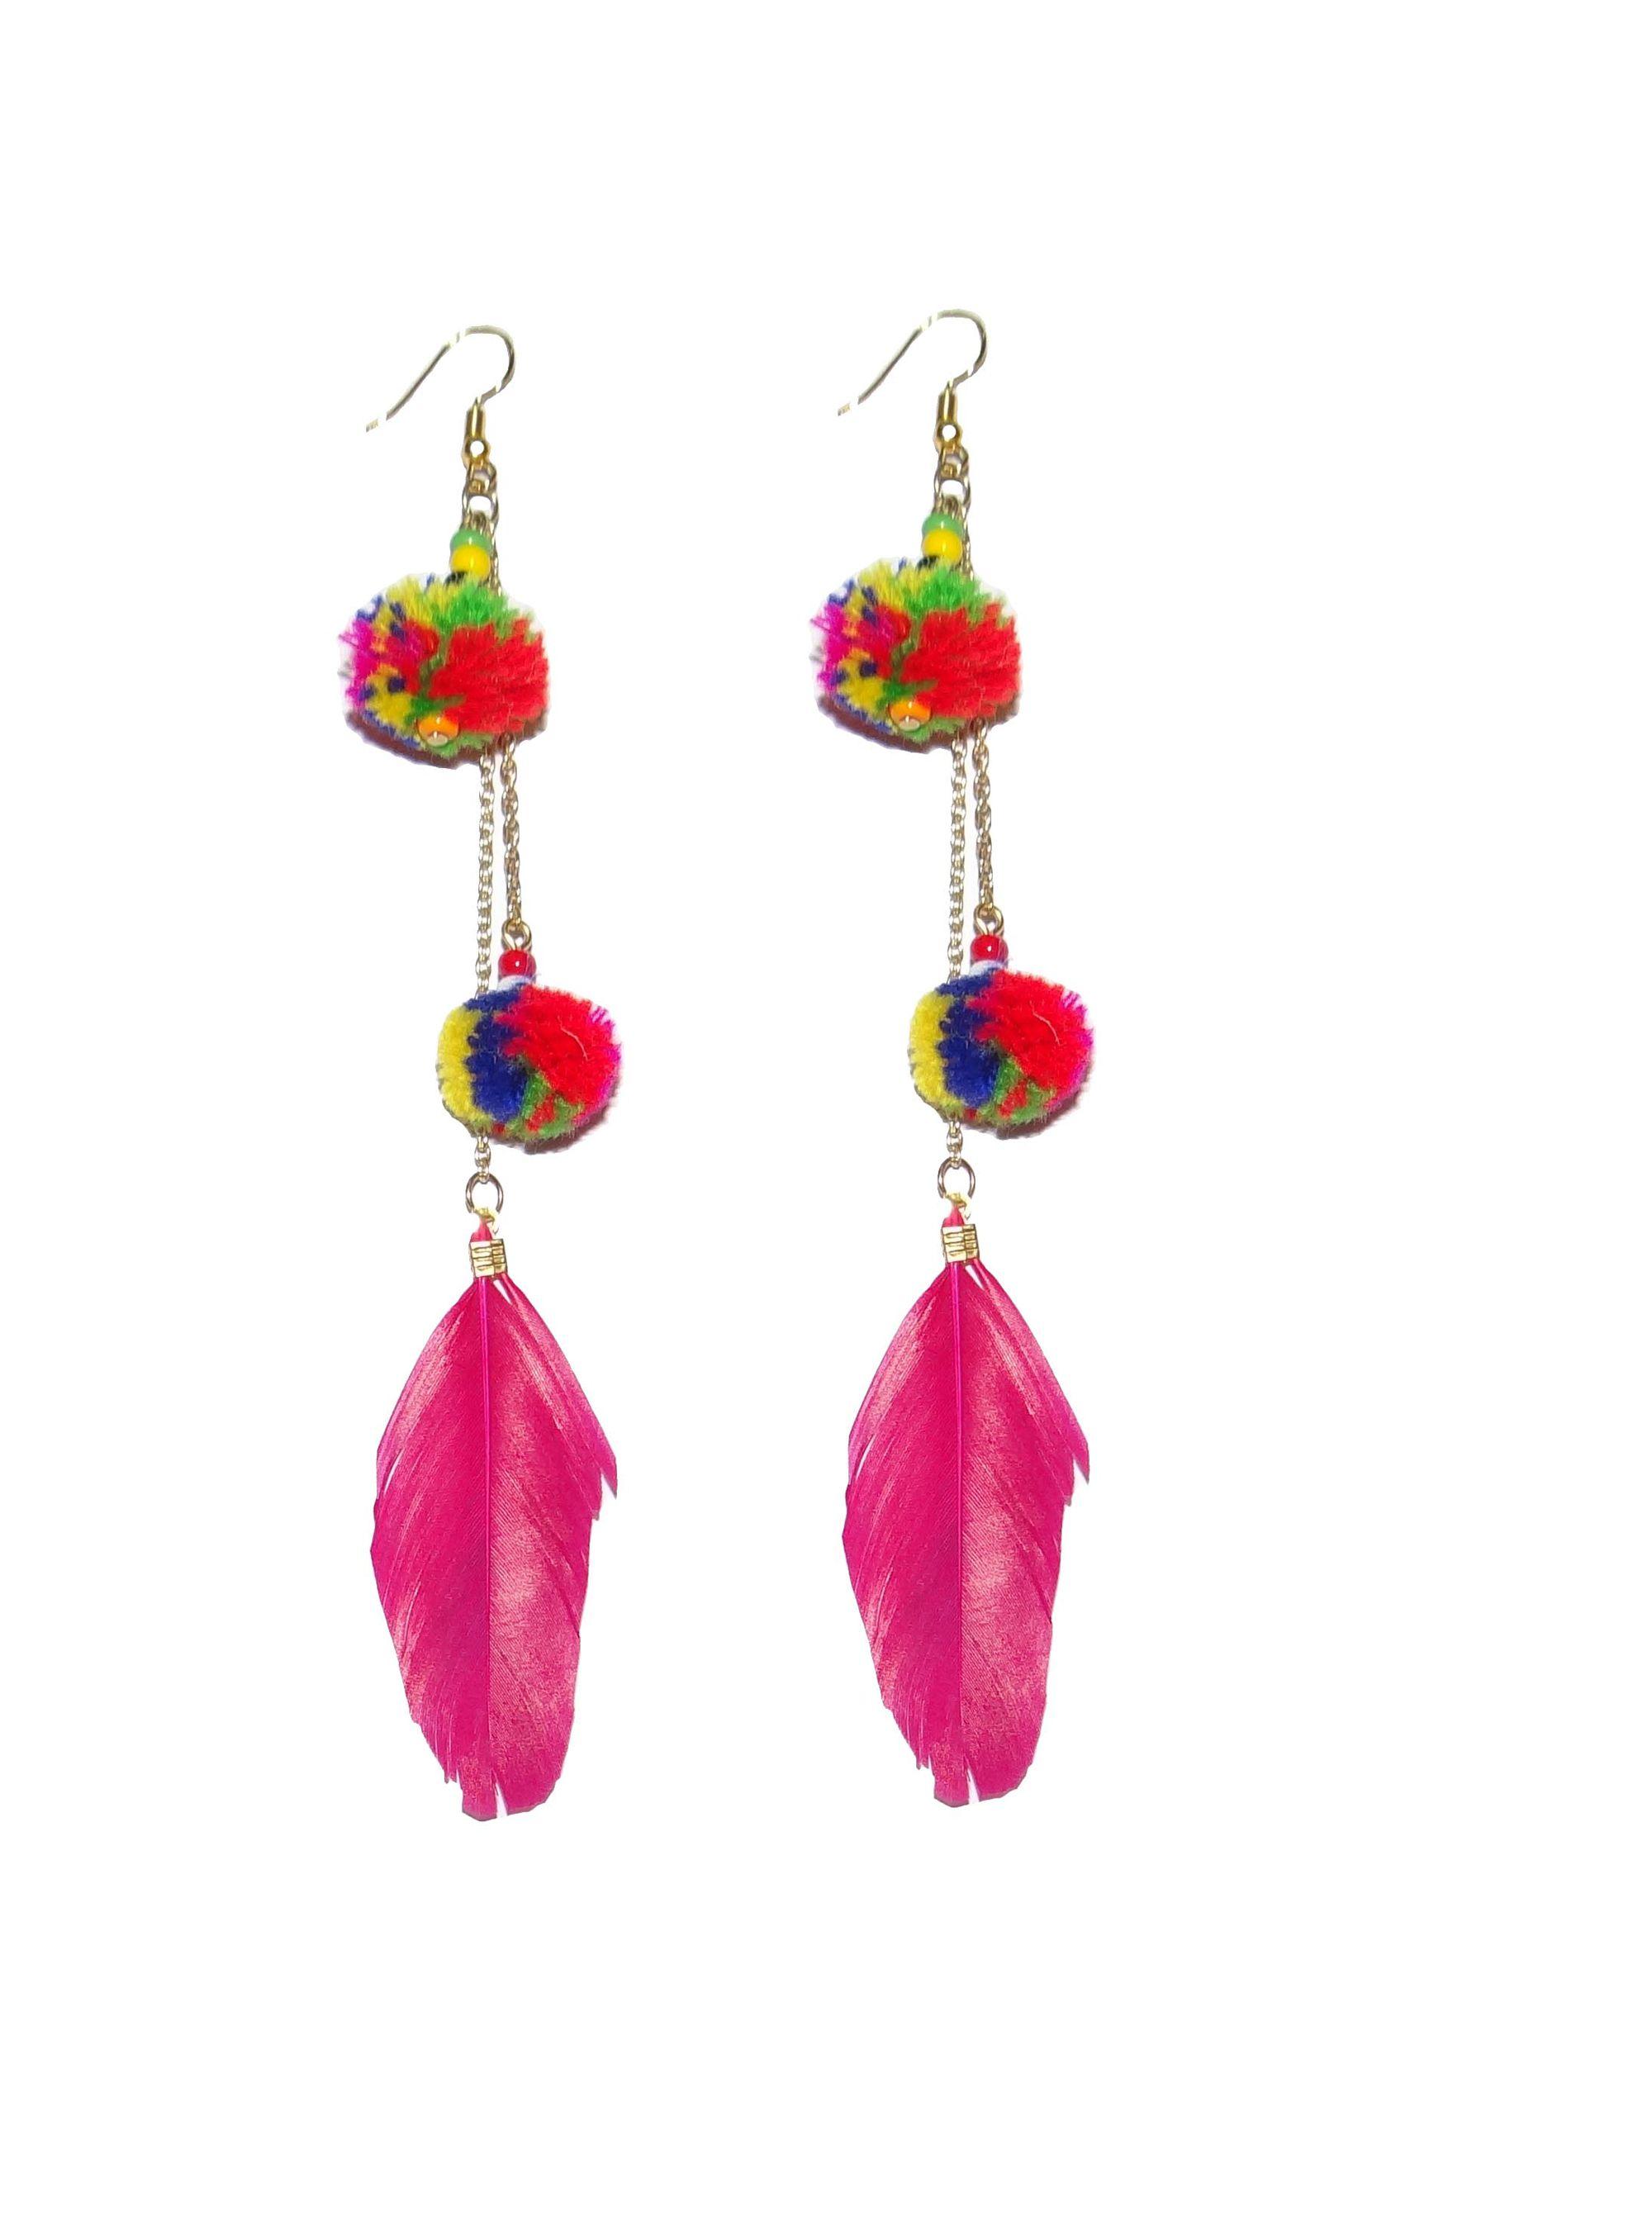 Zurii designer earring